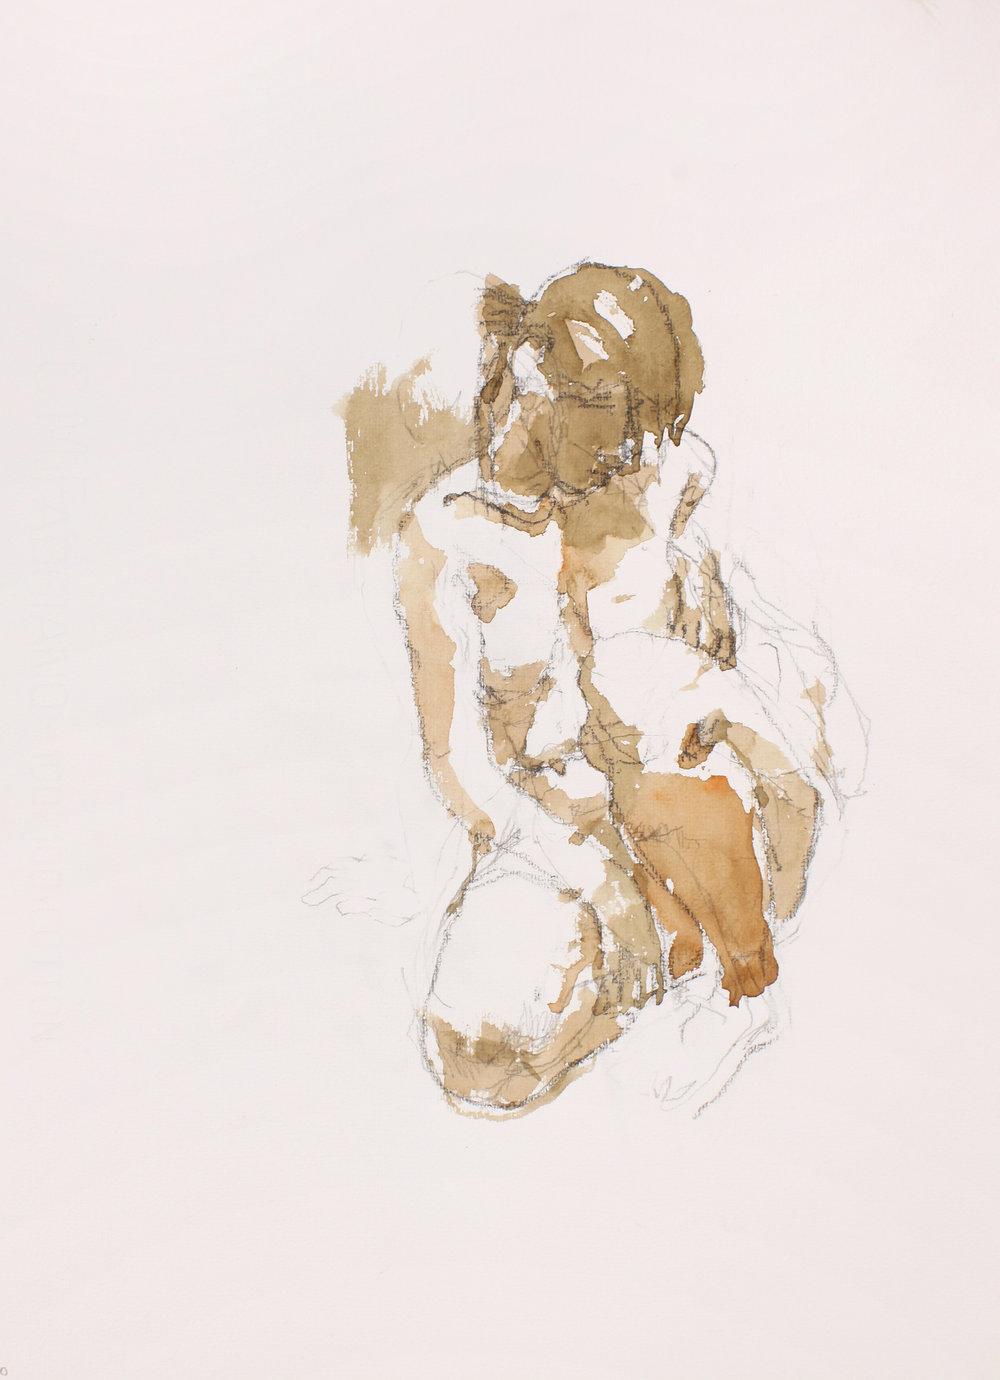 Kneeling Nude with Head Downwards